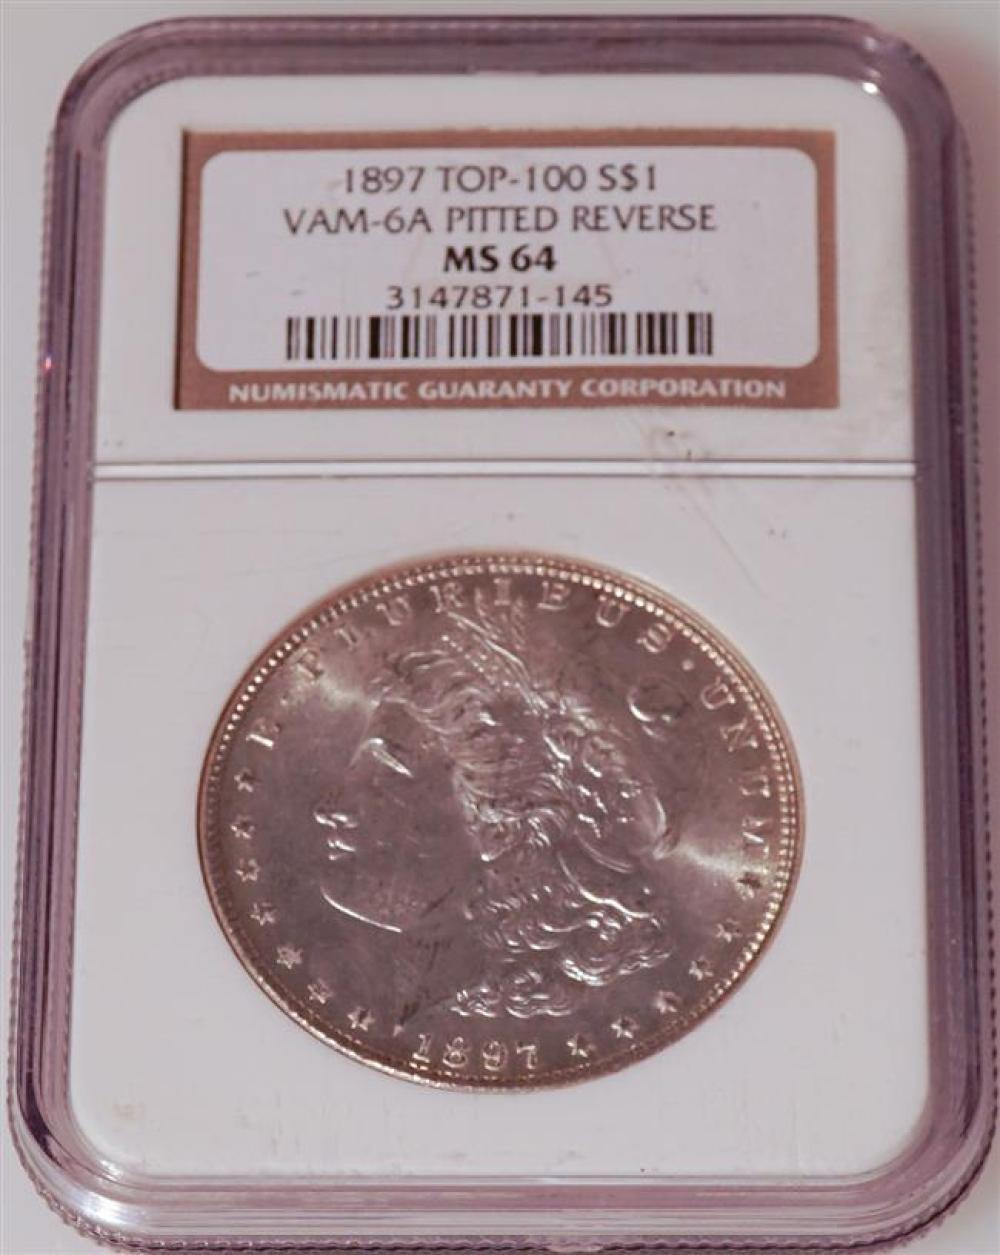 U.S. 1897-P Morgan Silver Dollar, Top 100 Vam-6A Pitted Reverse